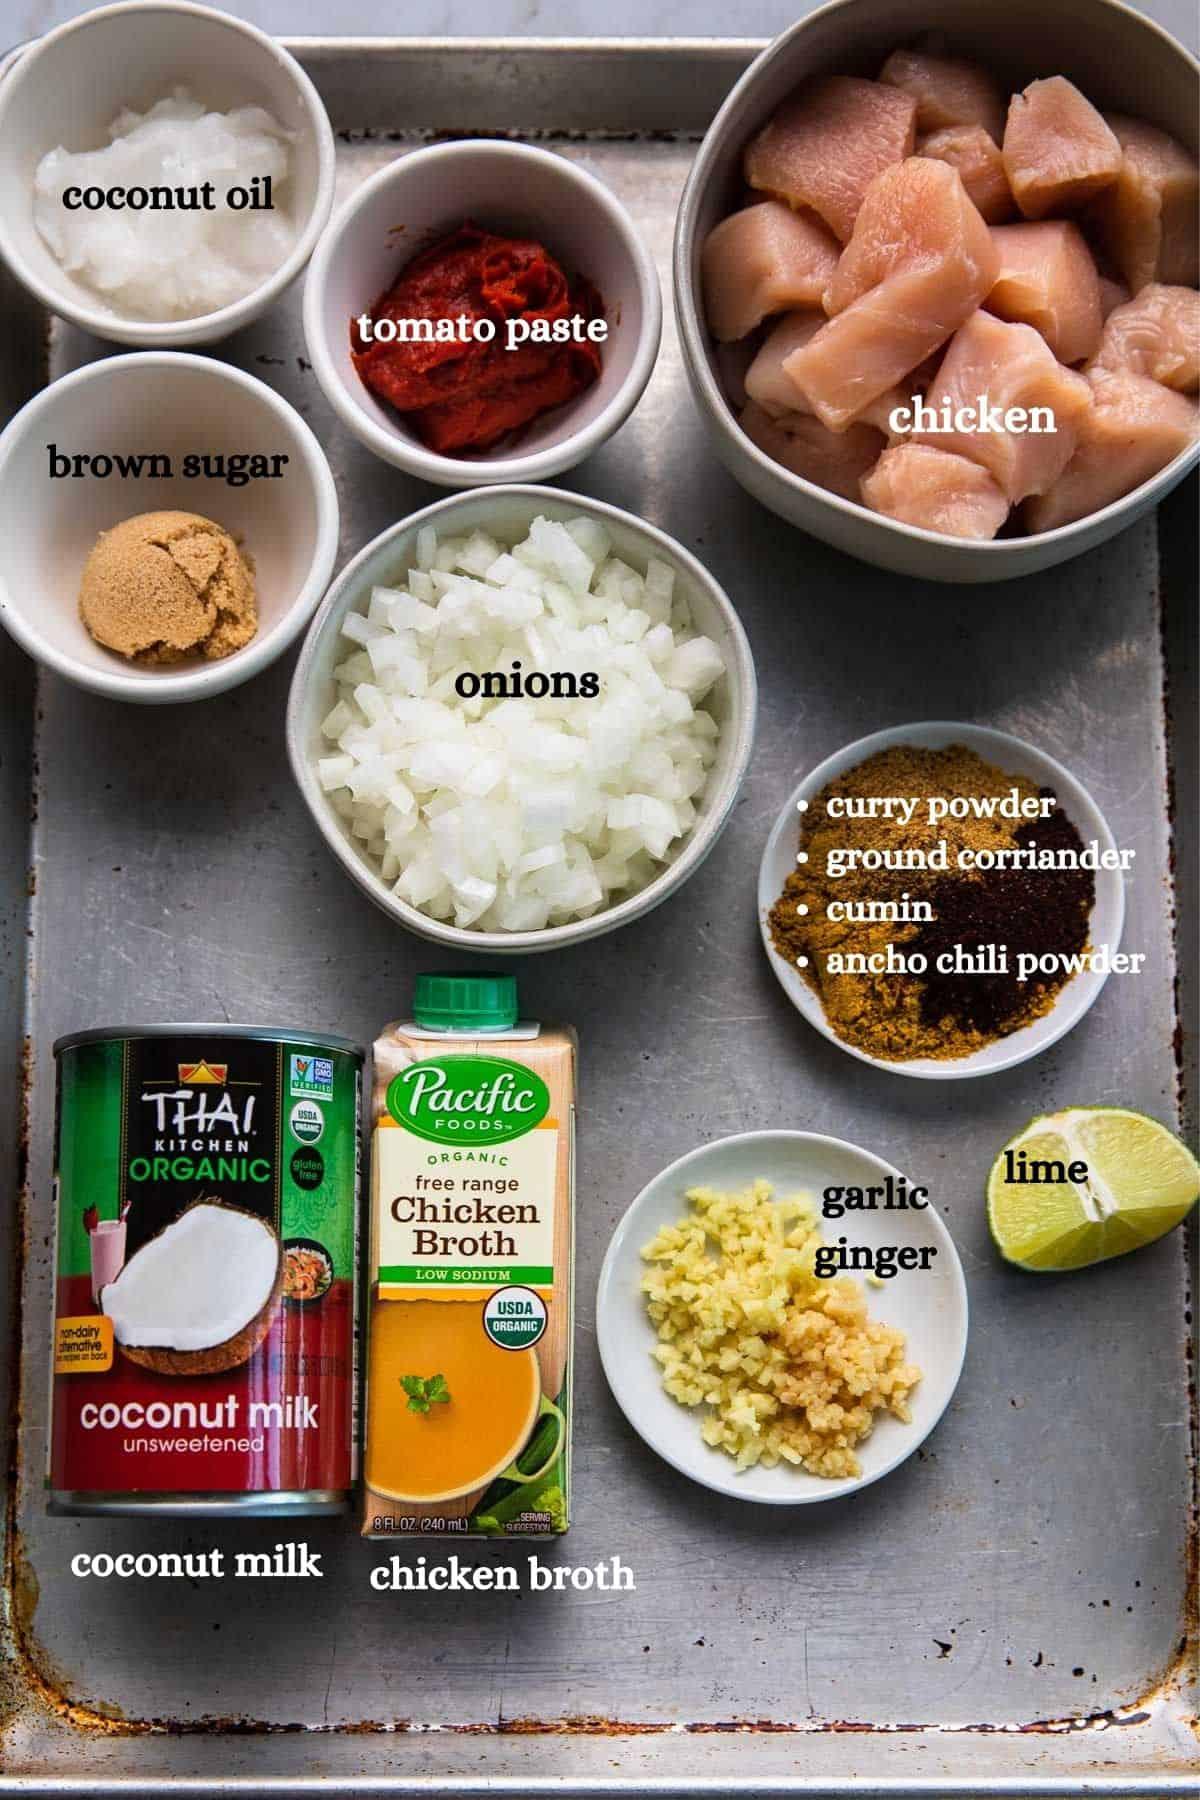 coconut oil, chicken, tomato paste, onions, spices, coconut milk, chicken broth, garlic, ginger, lime